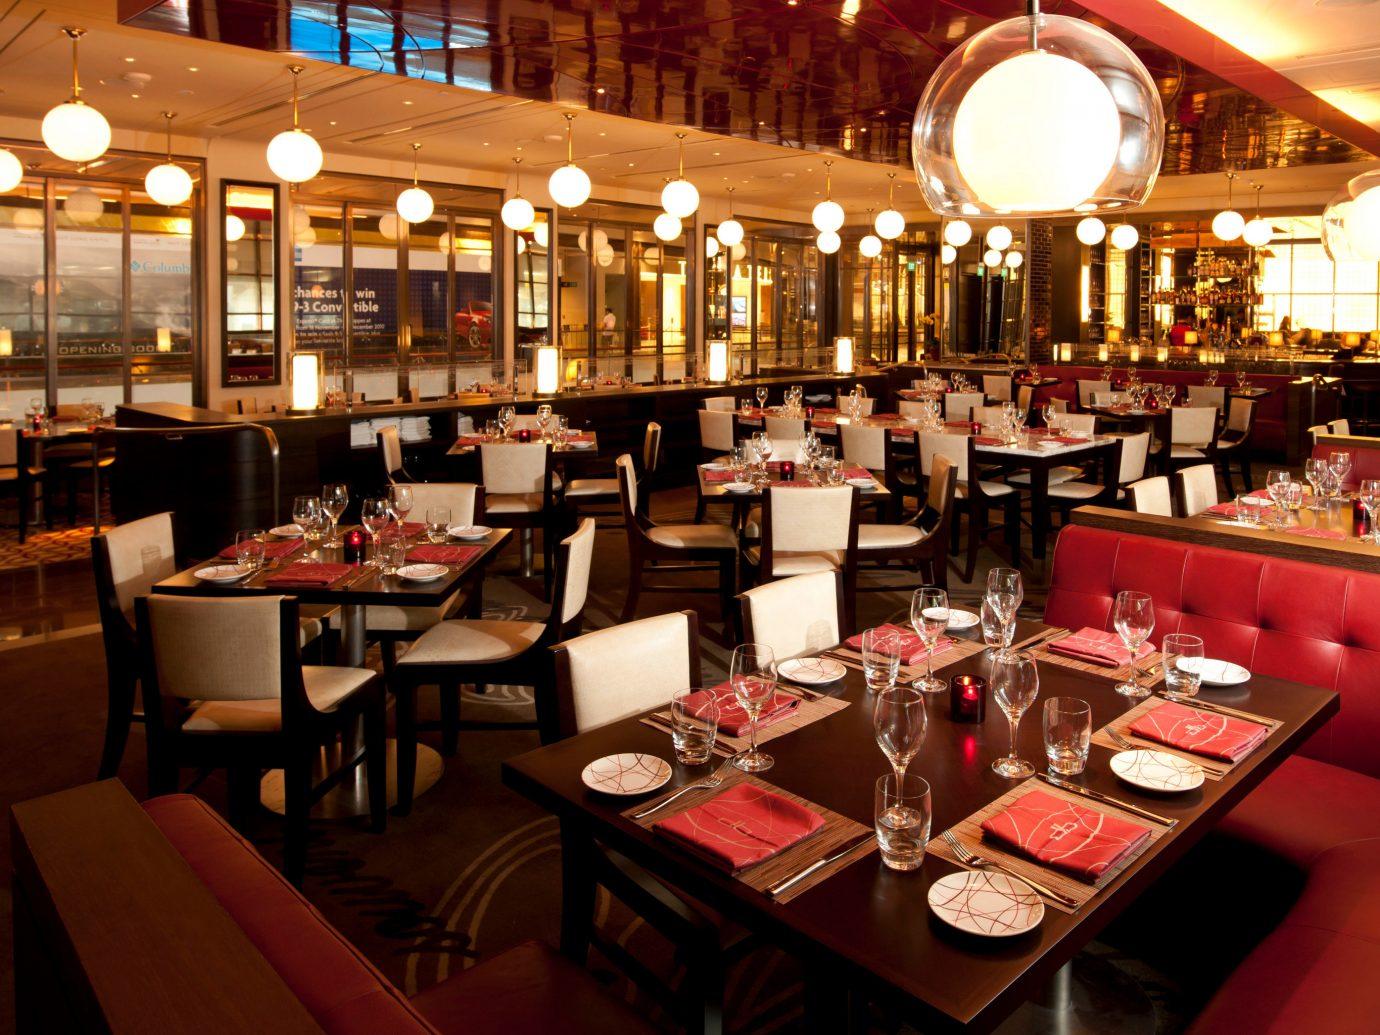 Restaurant at Marina Bay Sands, Singapore